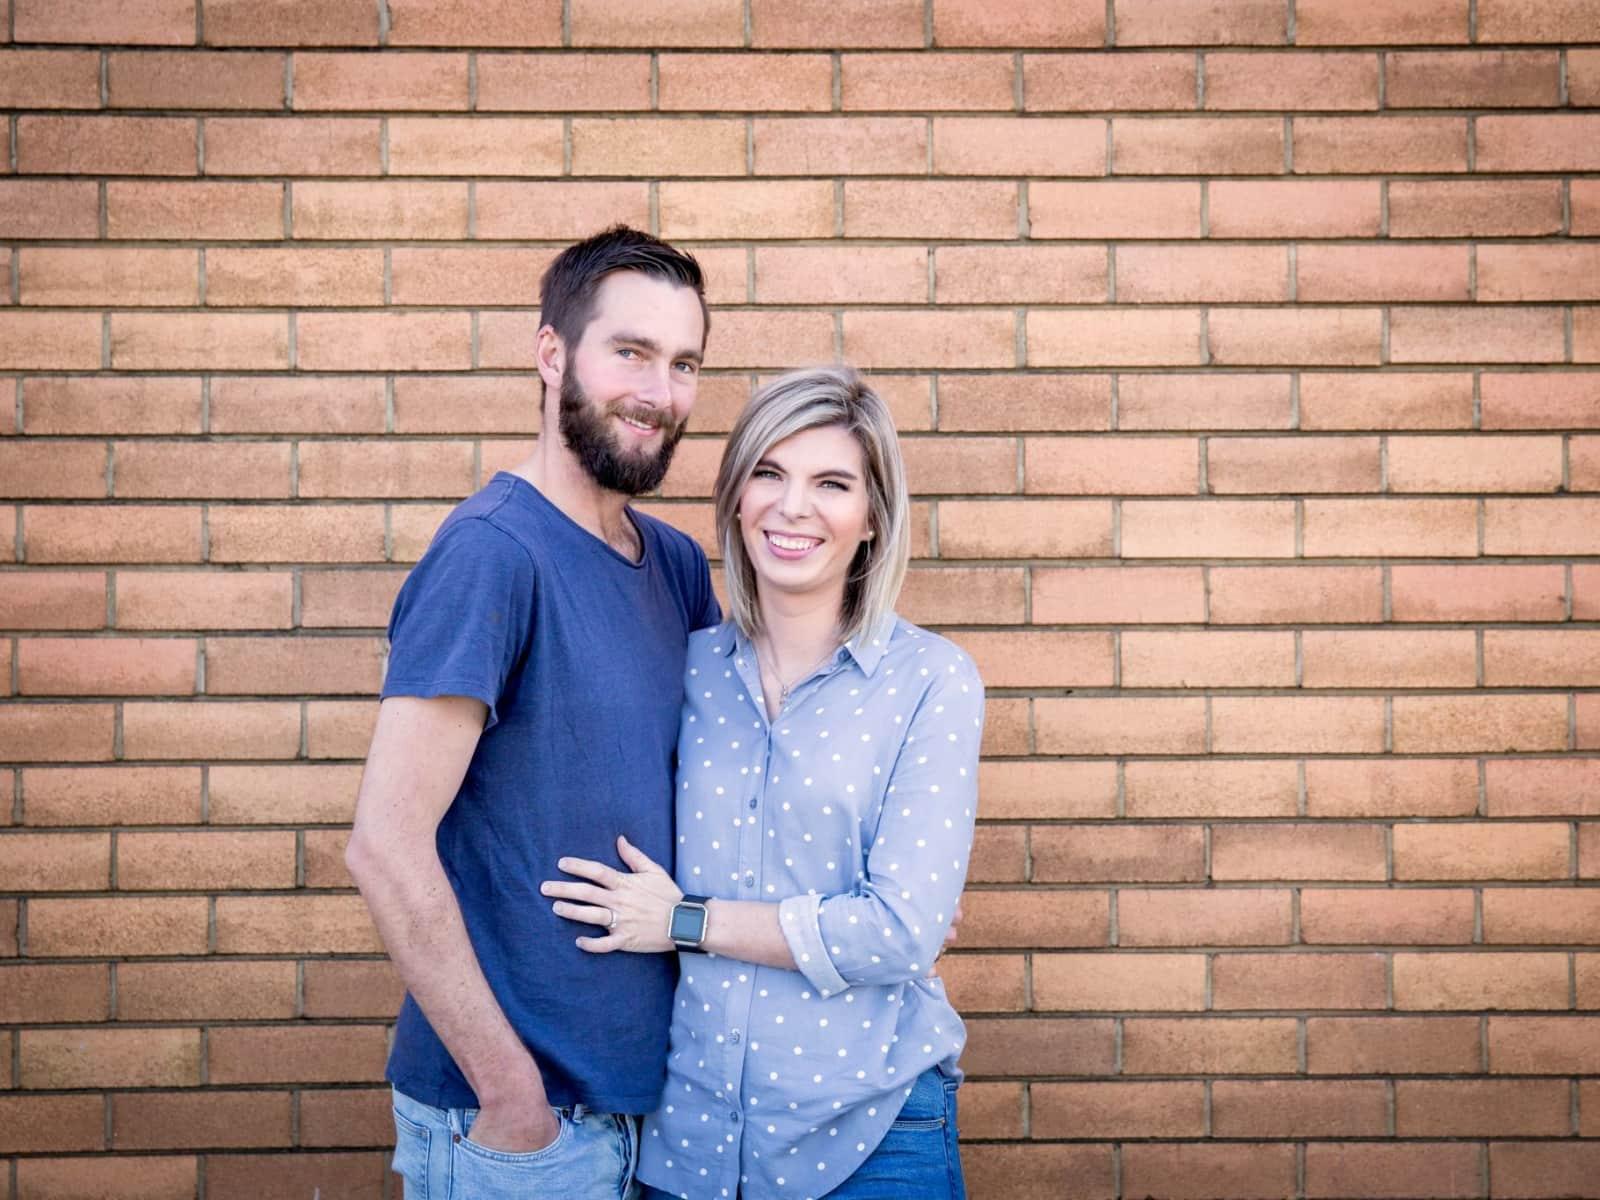 Tim & Sarah from Calgary, Alberta, Canada